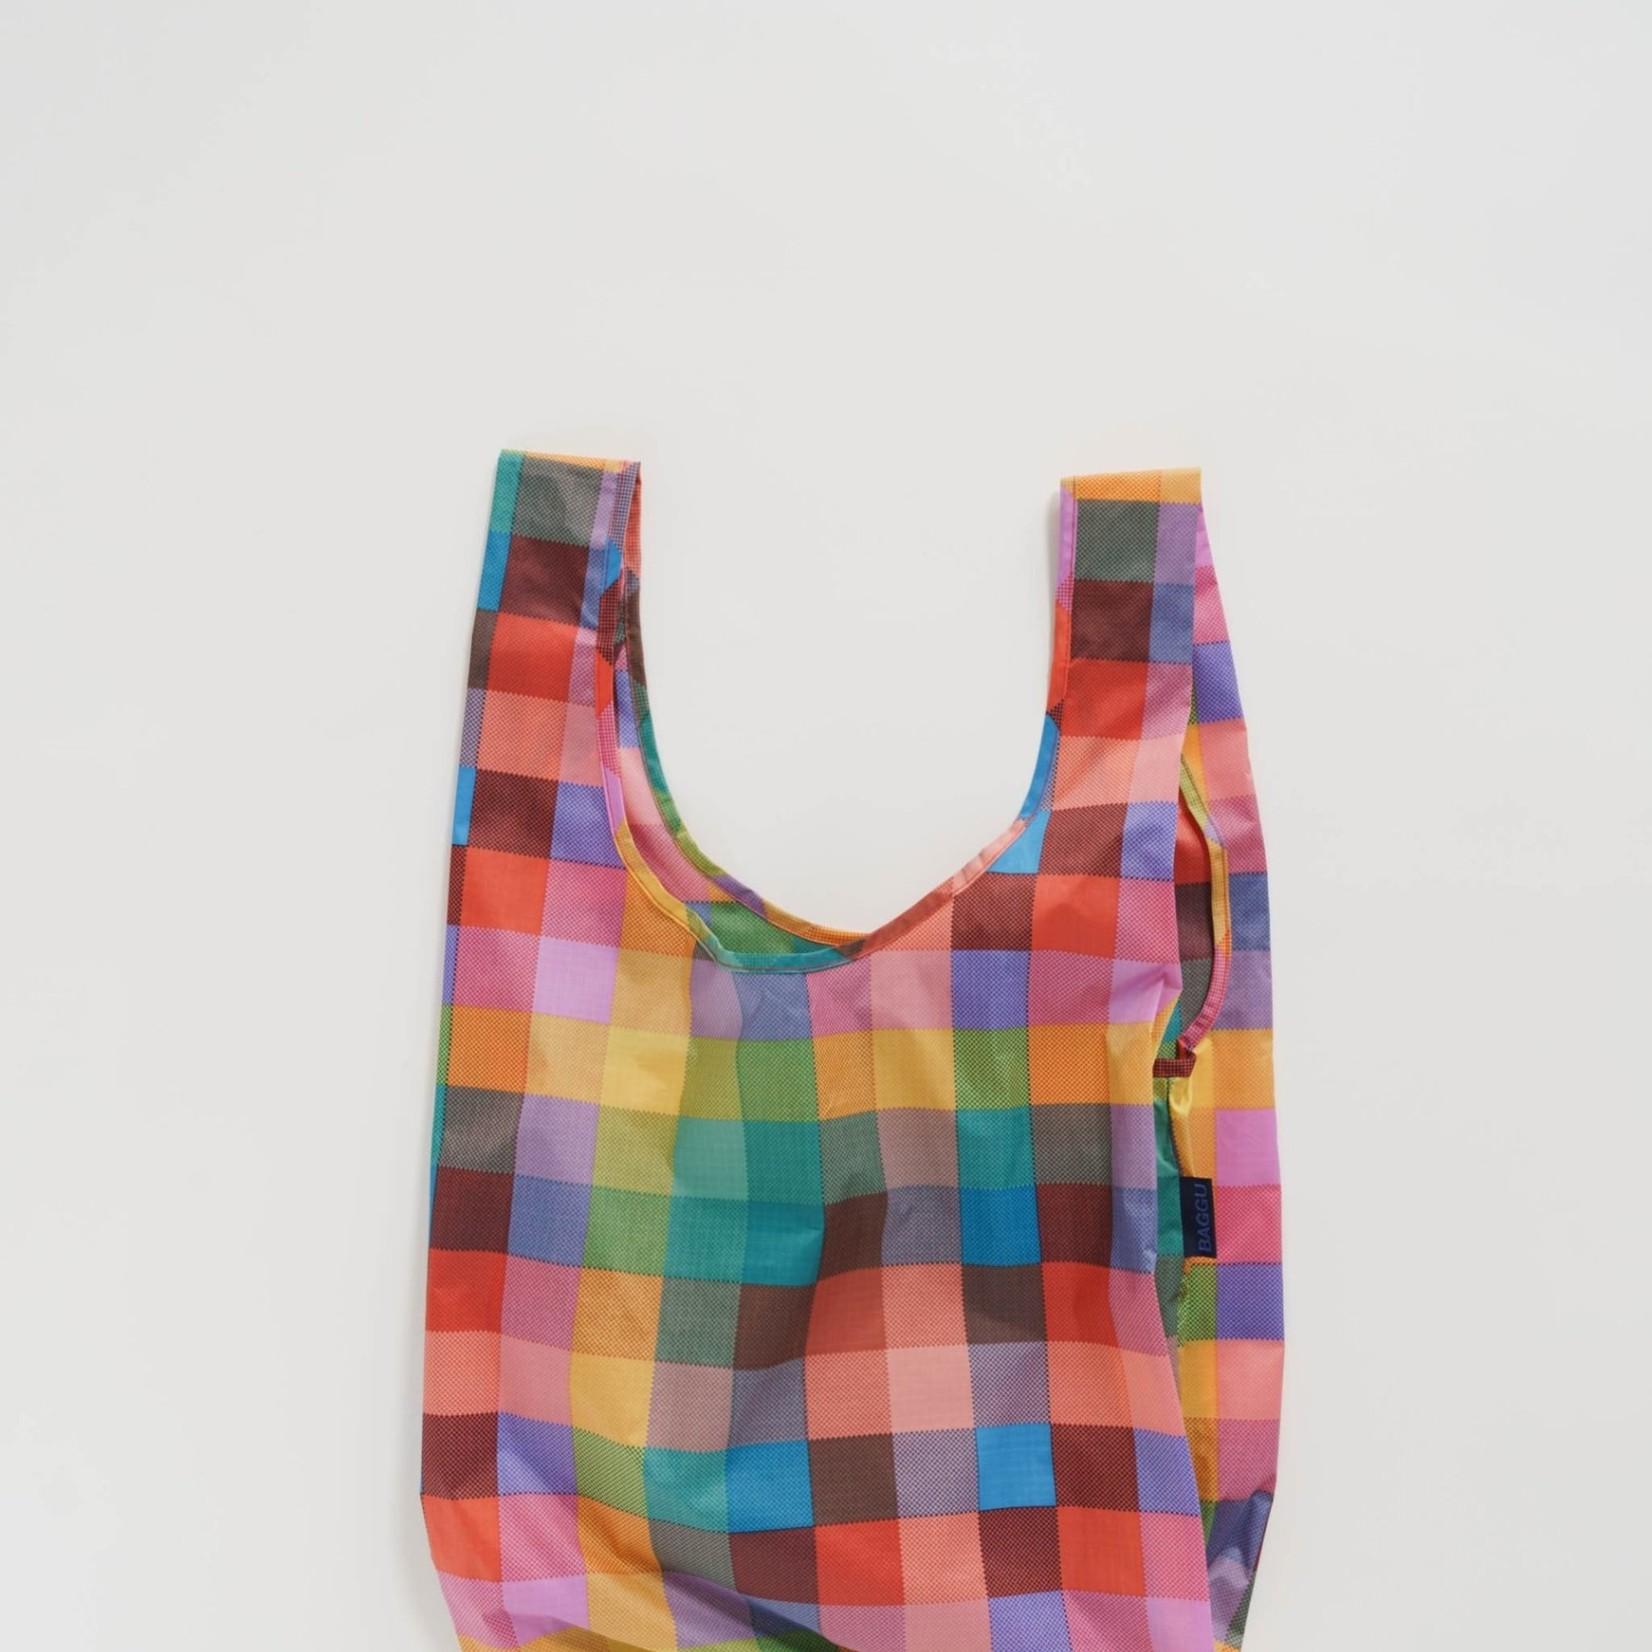 Baggu Baggu Reusable Bag Standard Madras No. 1